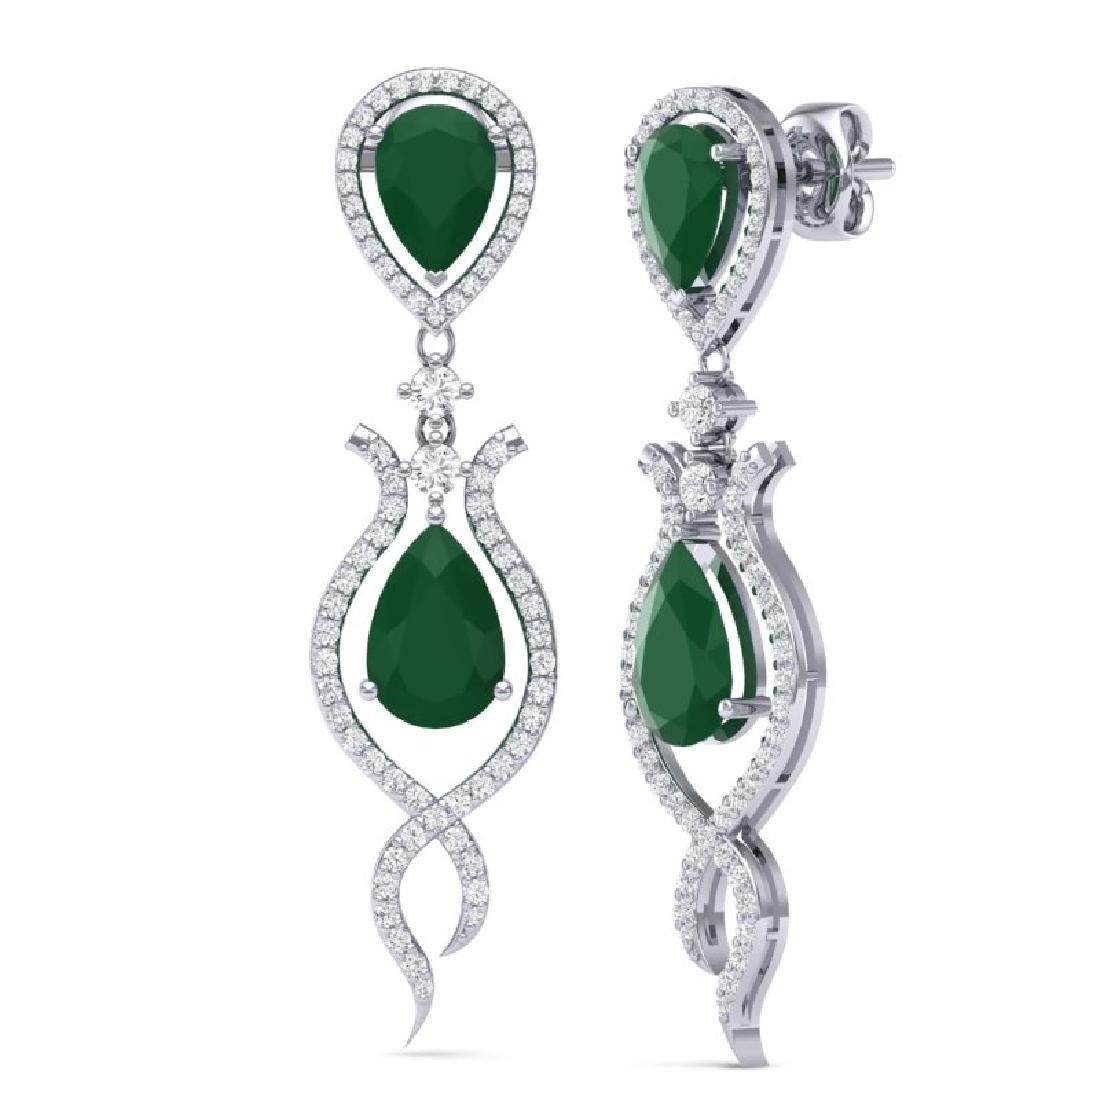 16.57 CTW Royalty Emerald & VS Diamond Earrings 18K - 3